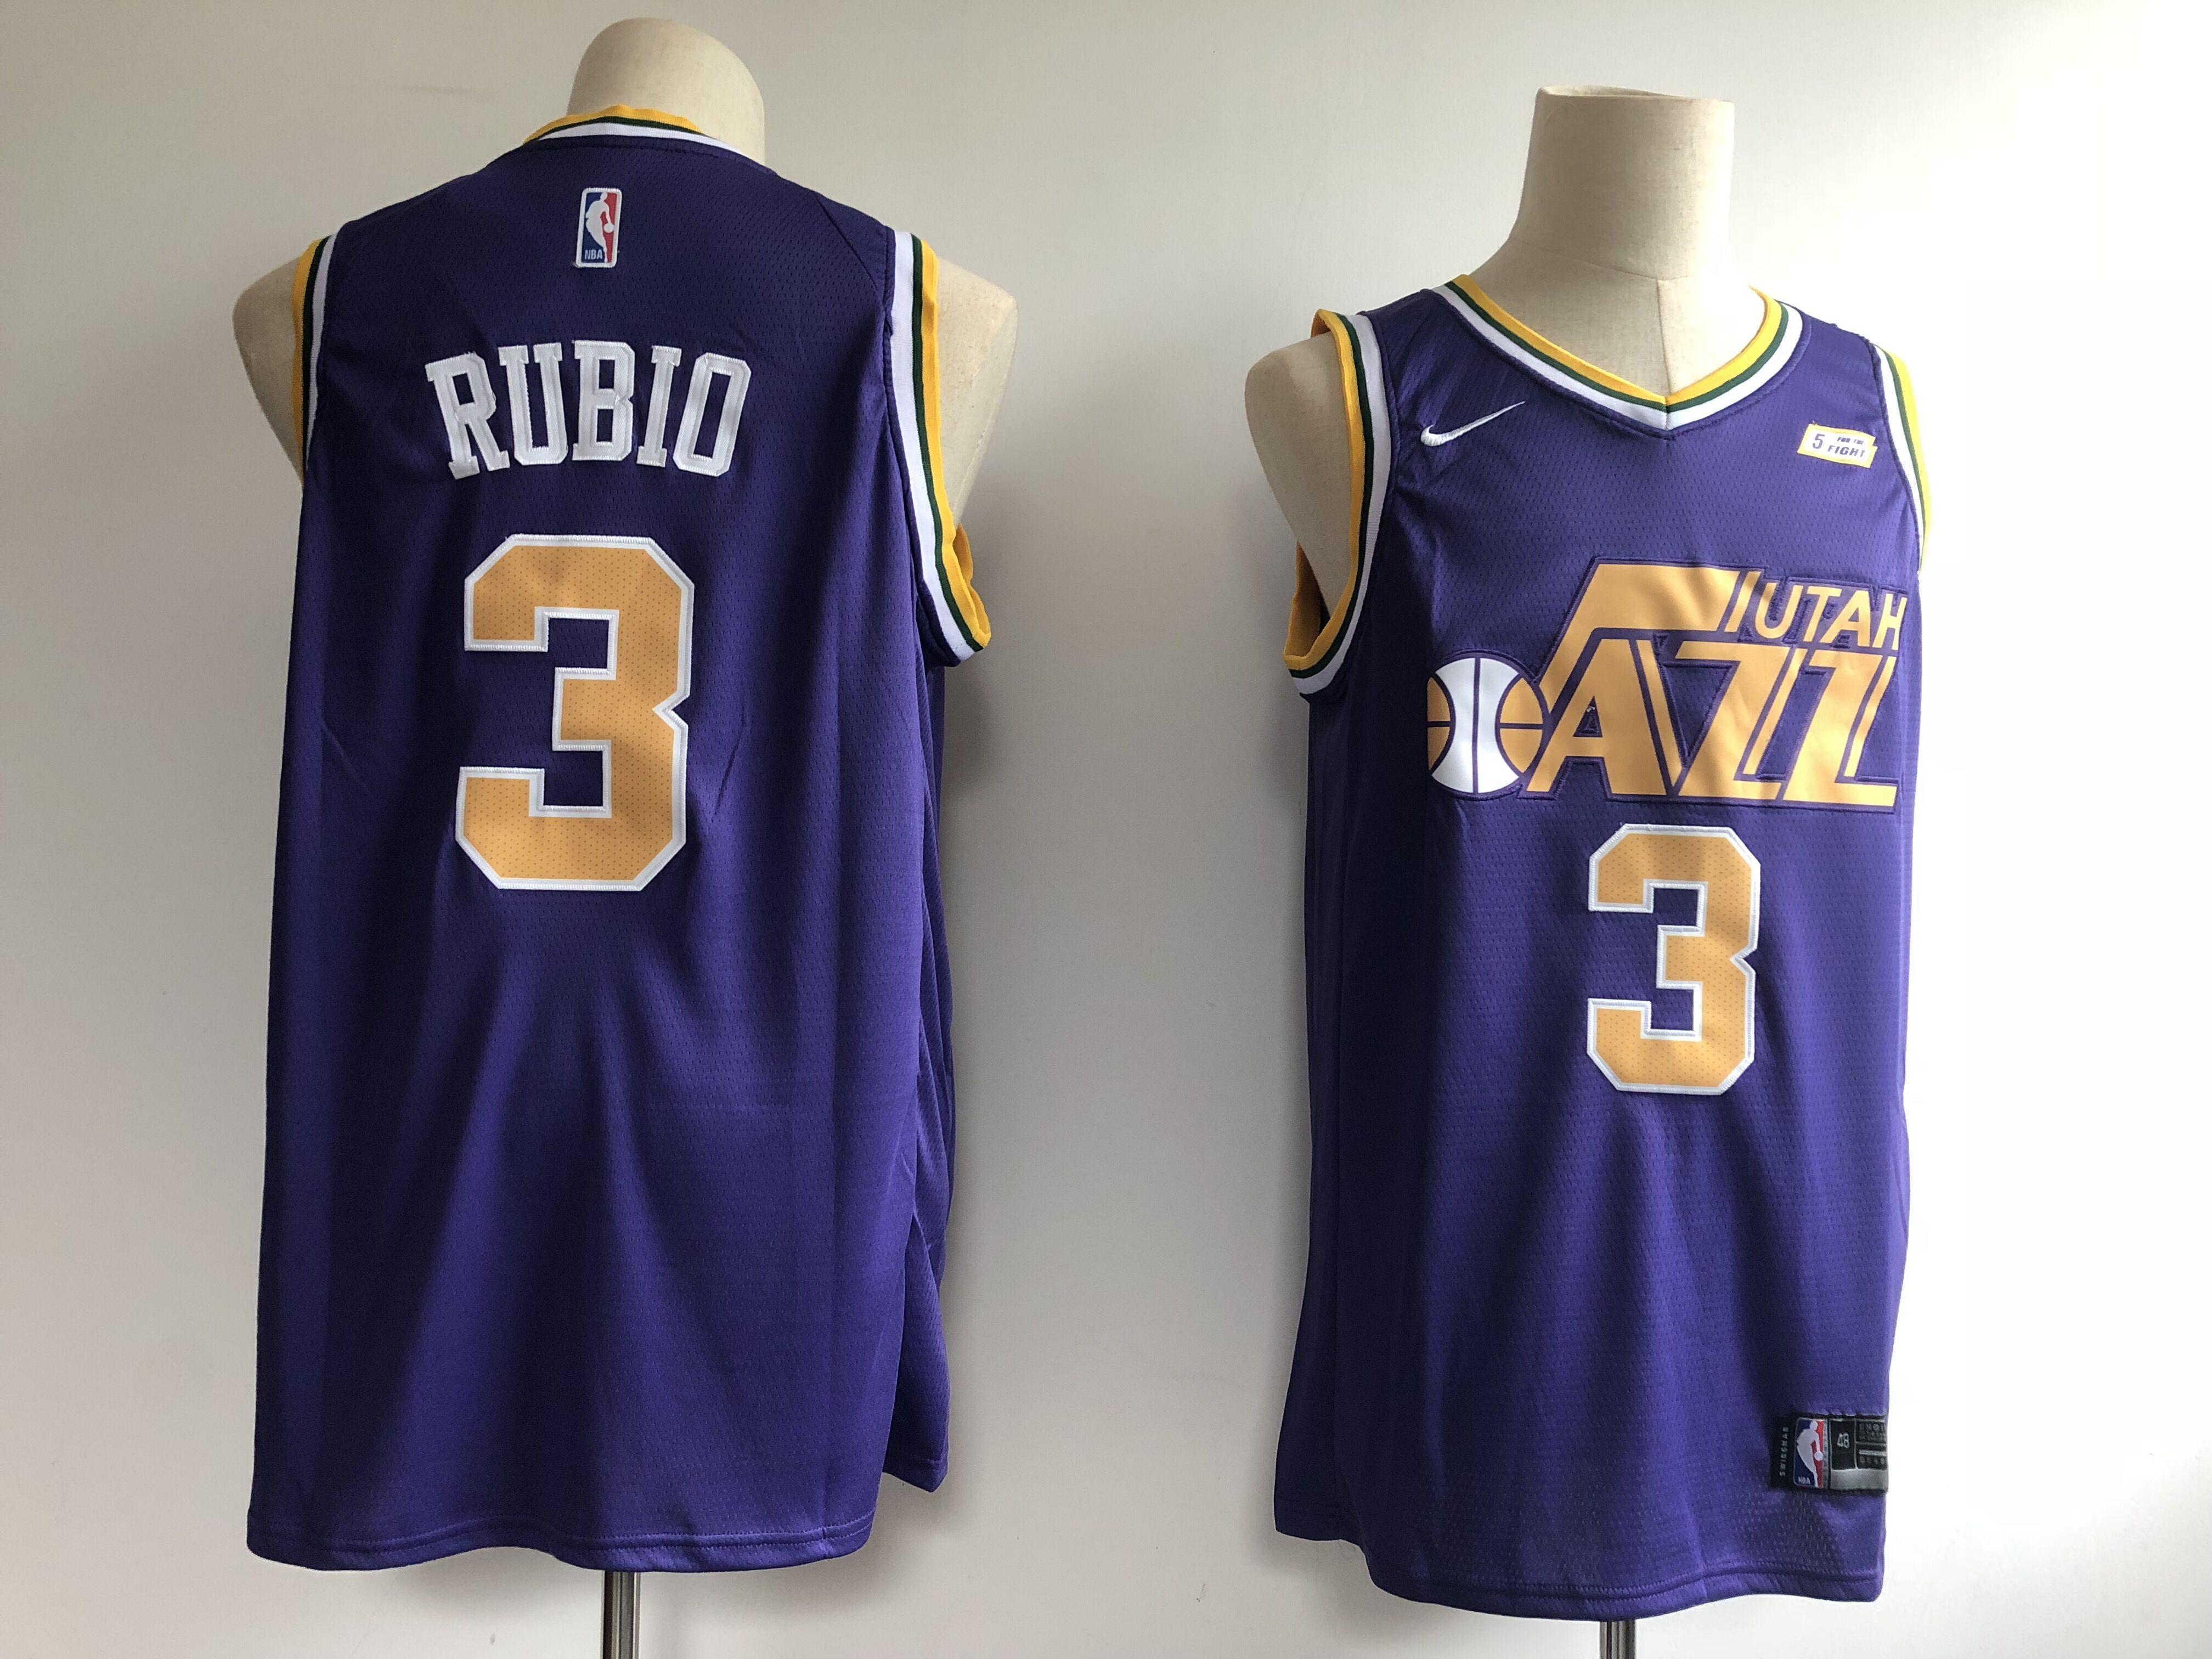 Jazz 3 Ricky Rubio Purple Nike Swingman Jersey